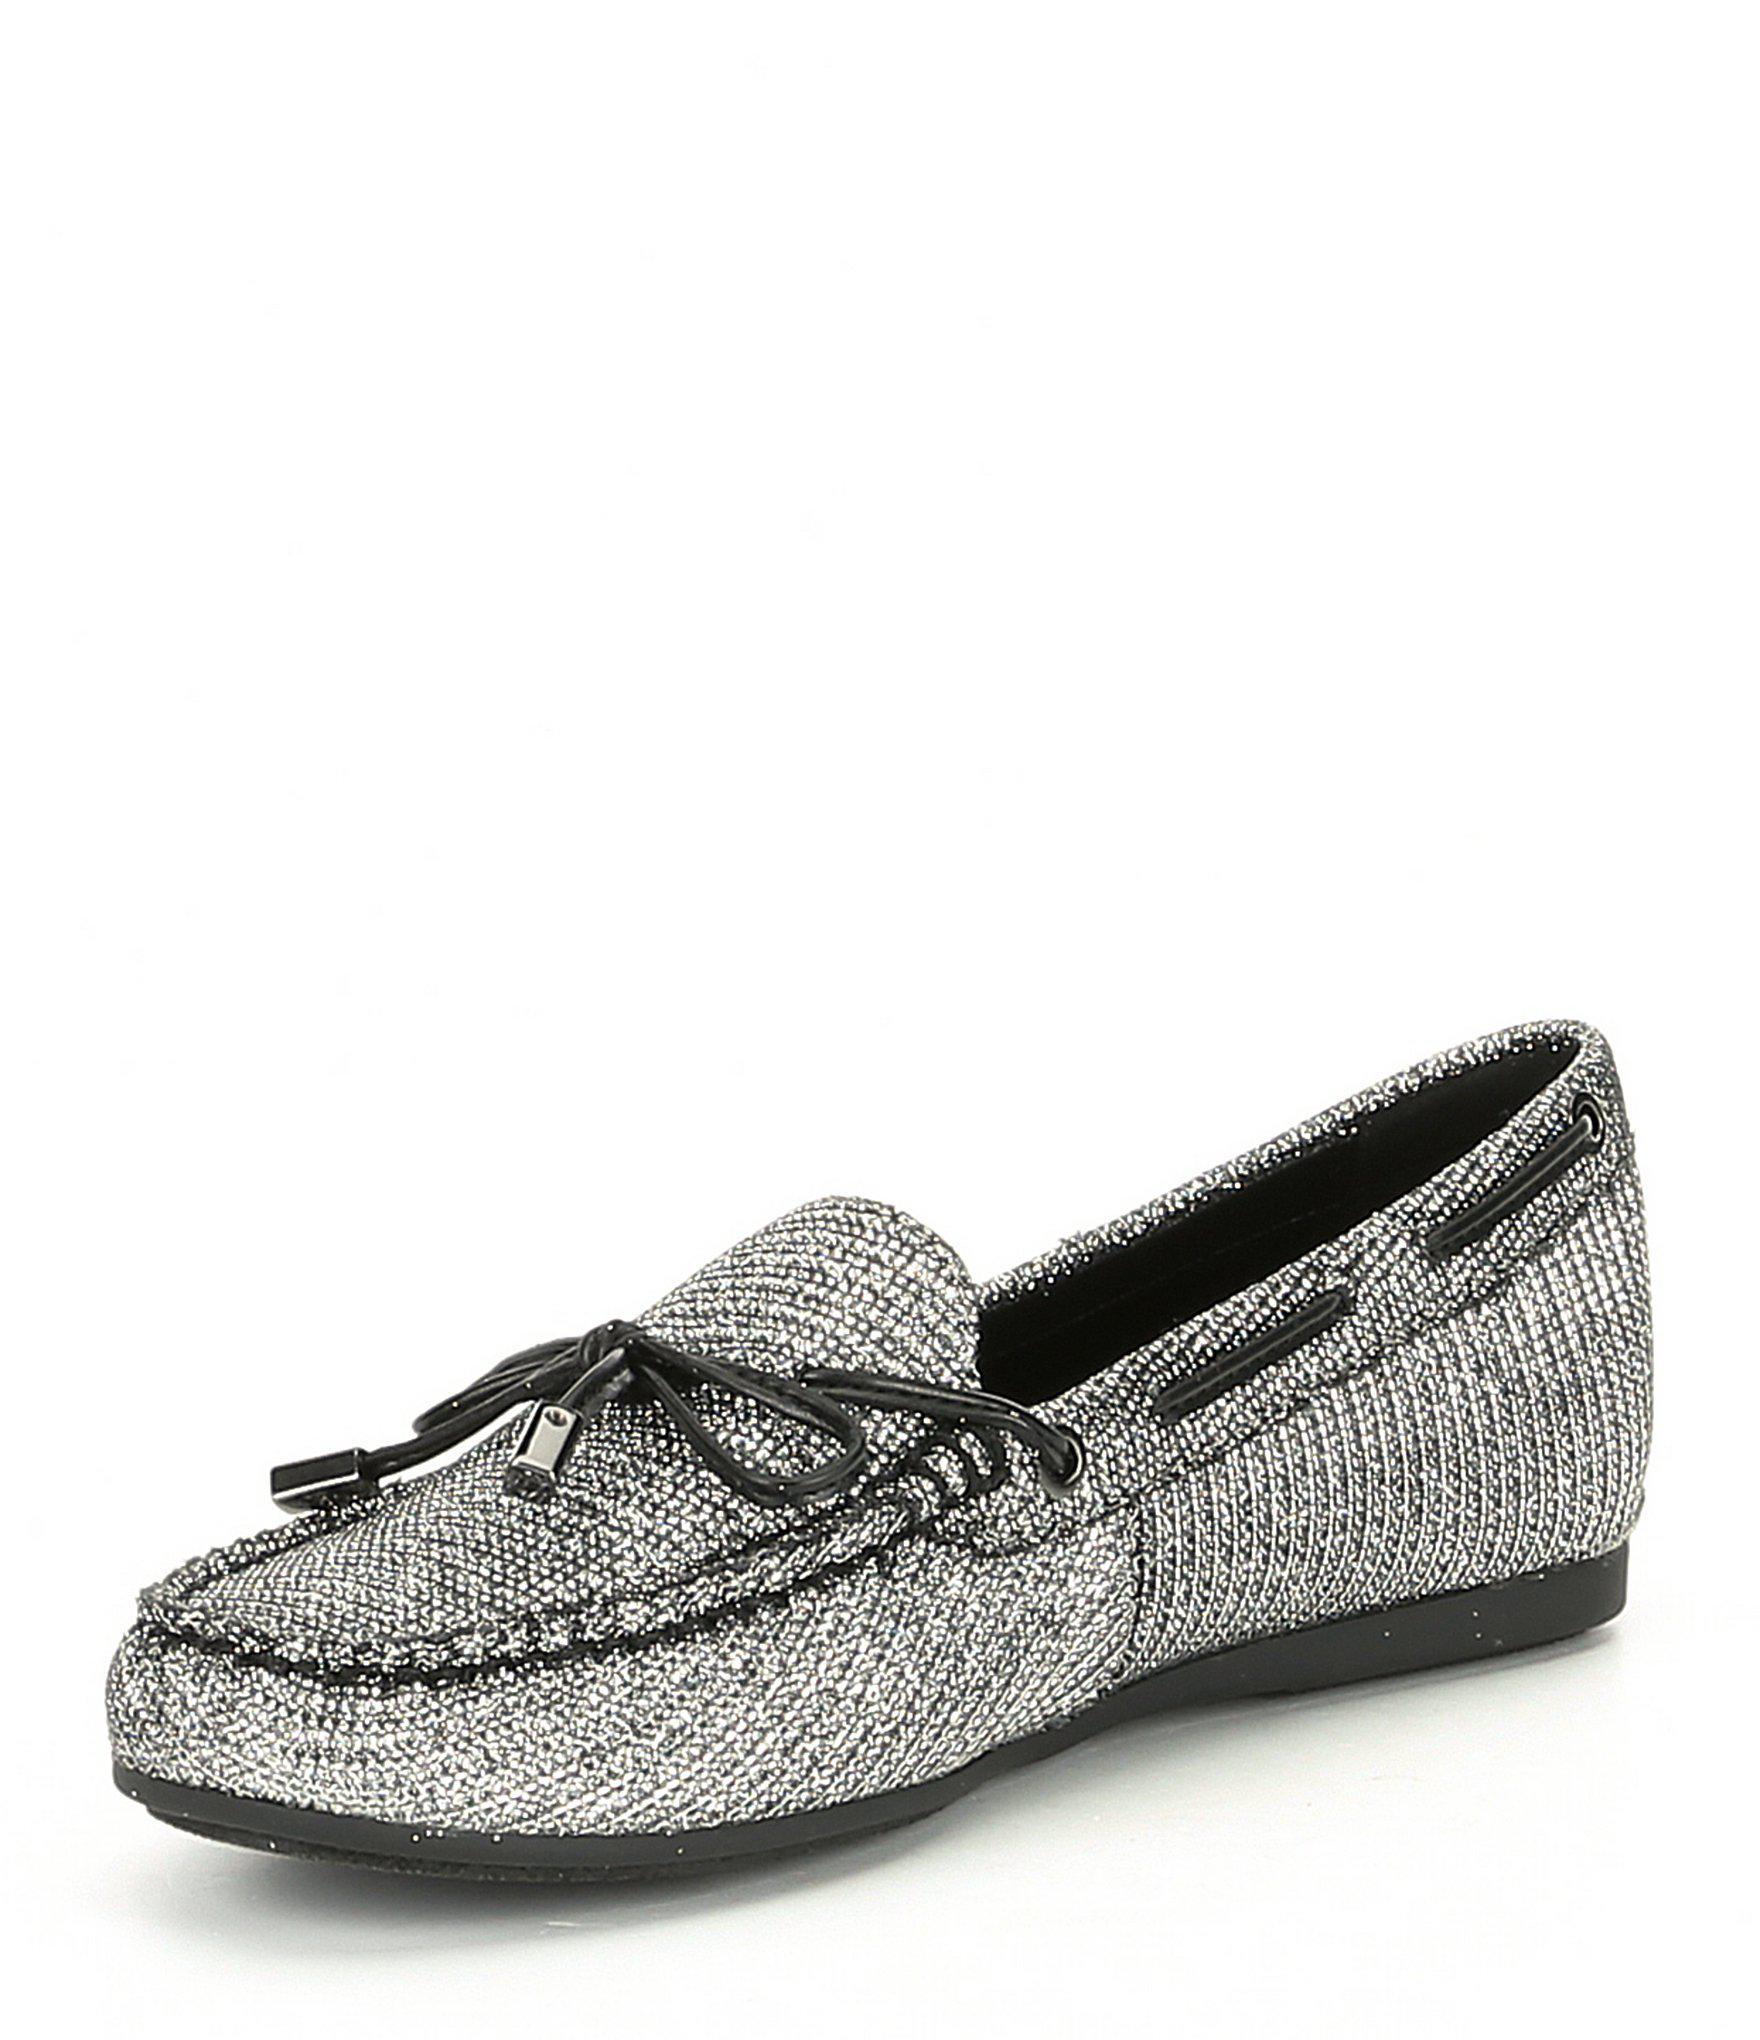 885fc997eed57c Michael Michael Kors Sutton Moc Womens Loafers & SlipOns Black /Silver 5.5  US /